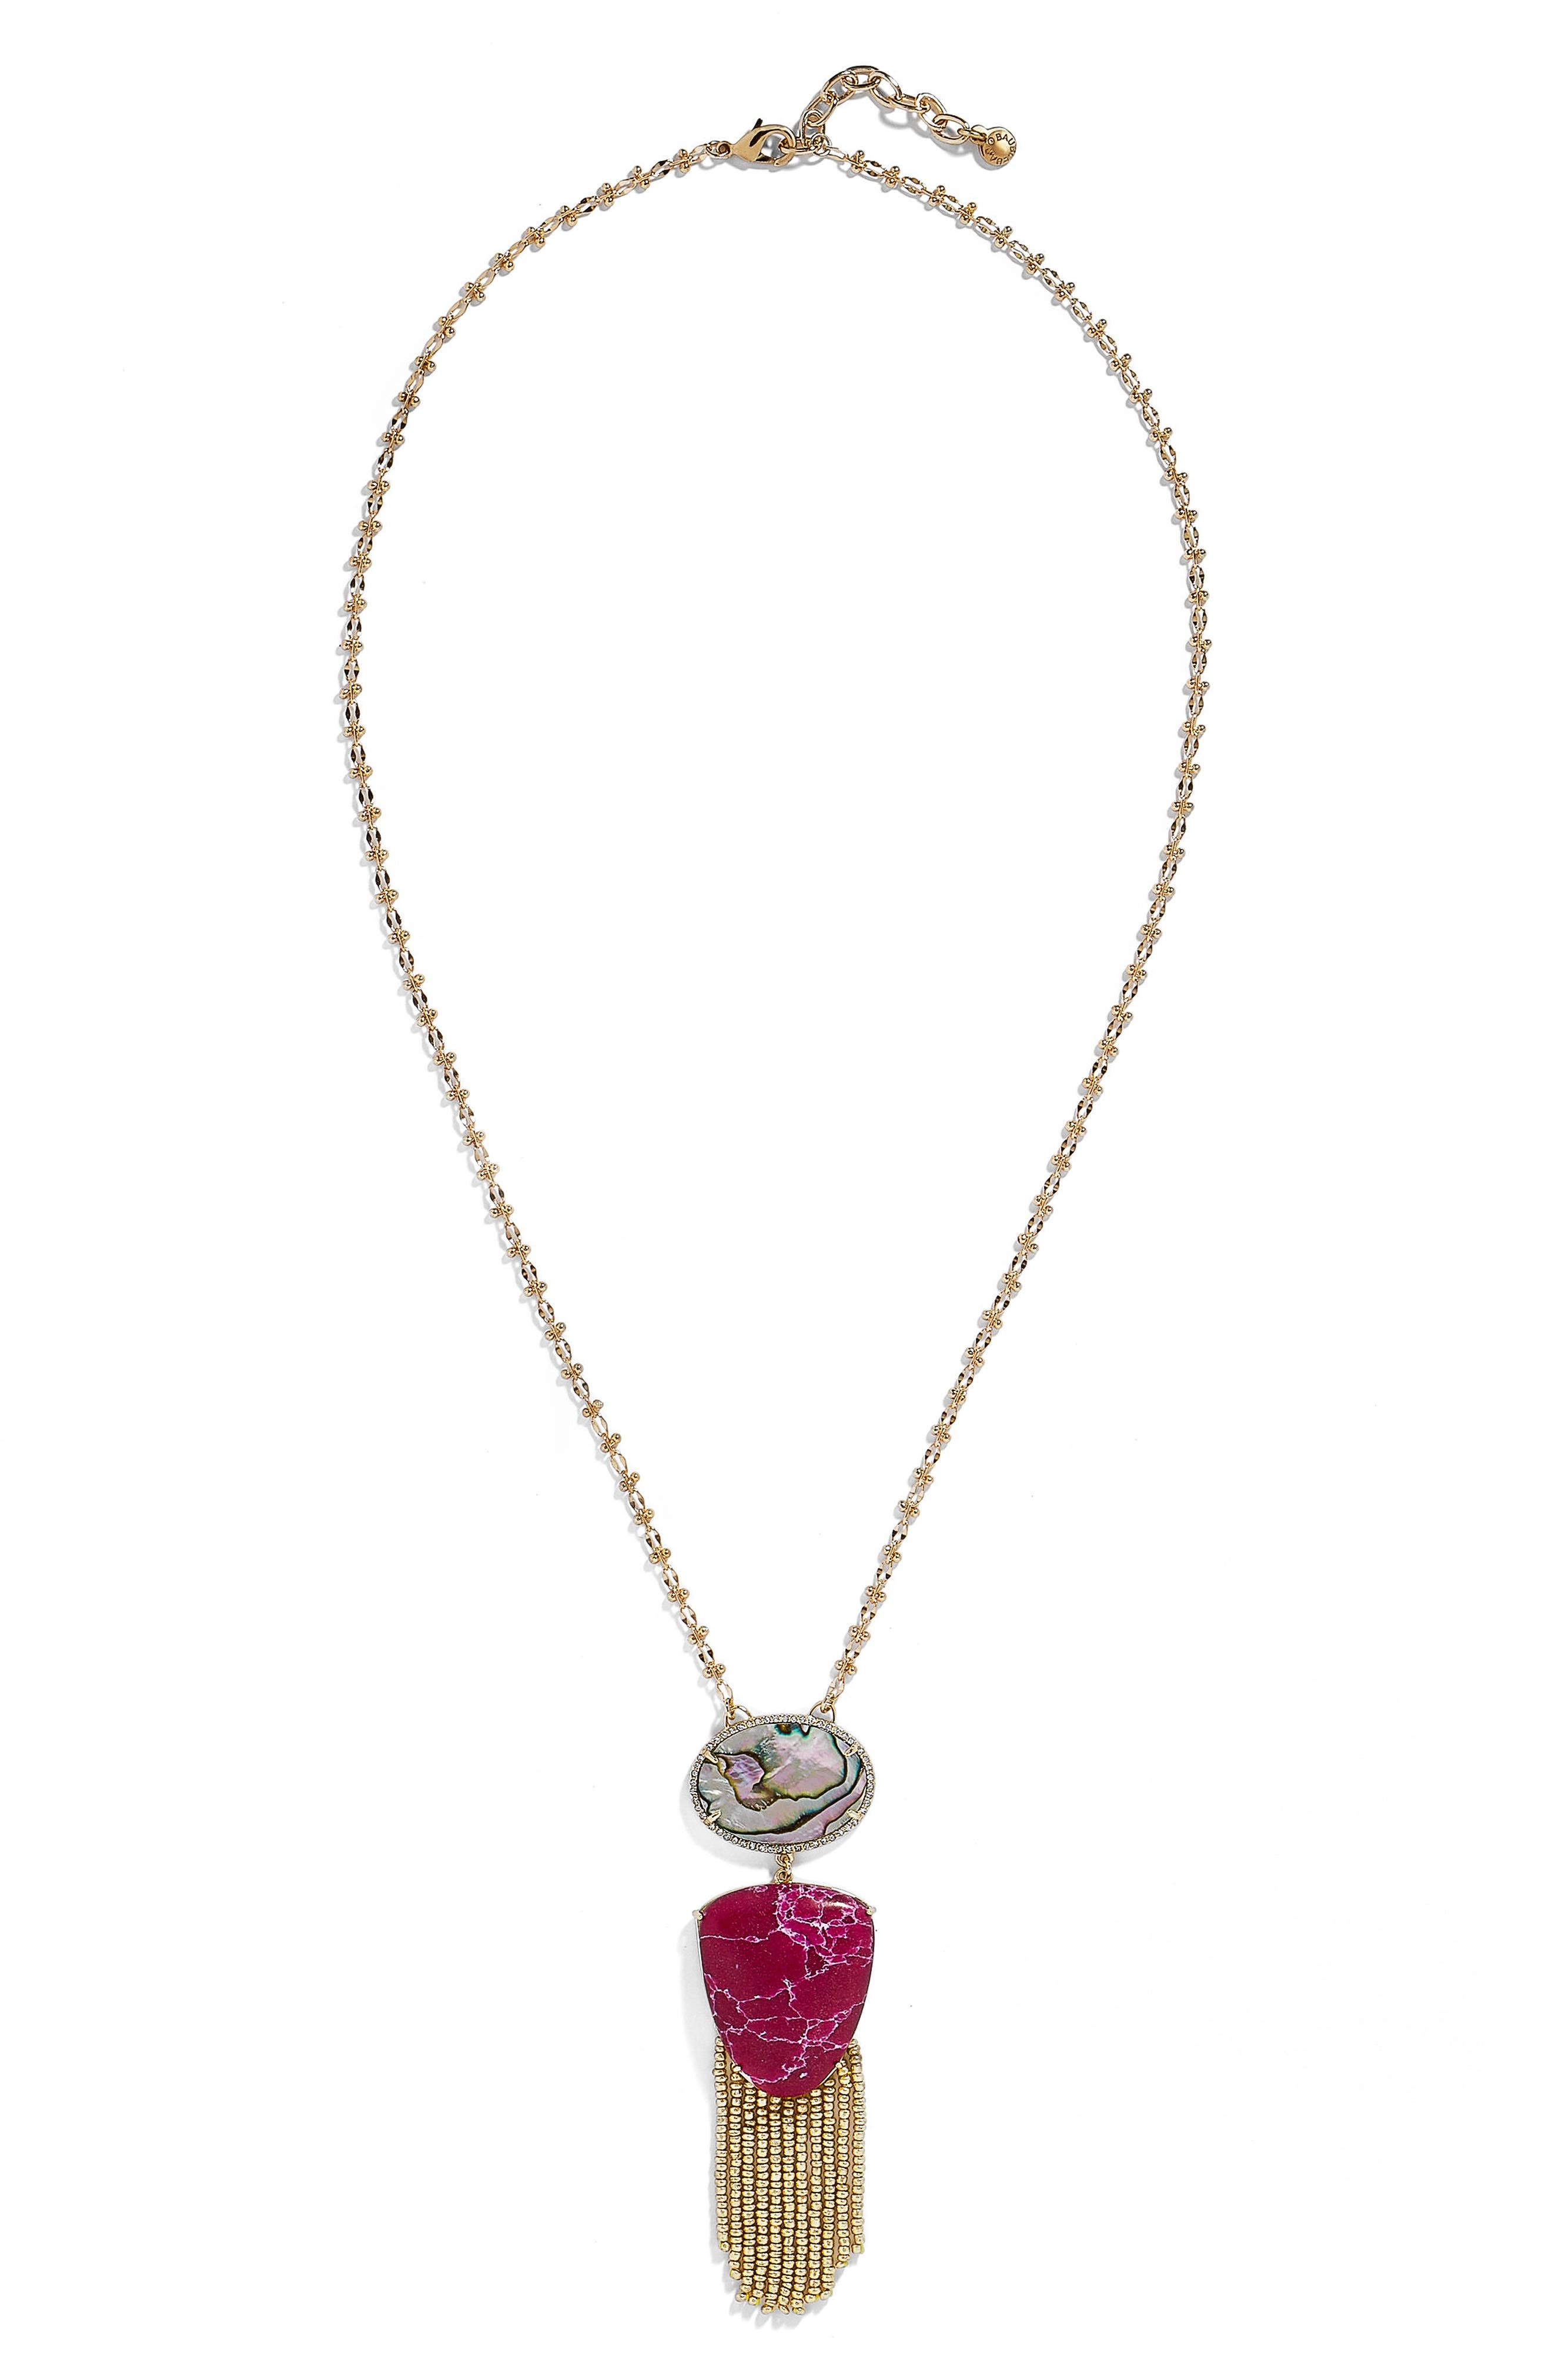 Moonglow Fringe Abalone Pendant Necklace,                             Main thumbnail 1, color,                             Fuchsia/ Abalone